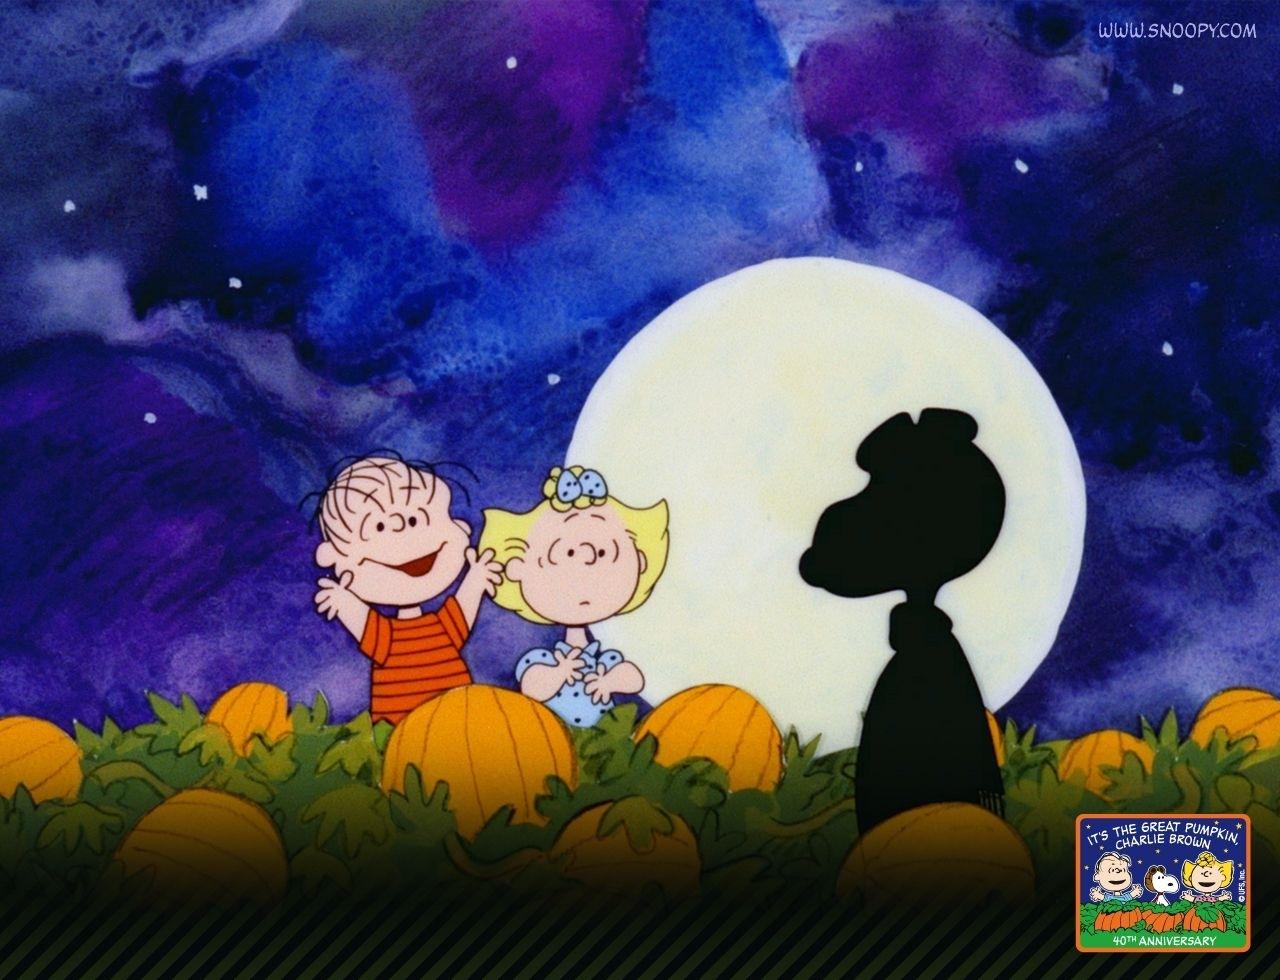 peanuts halloween wallpaper   snoopy desktops / free movie